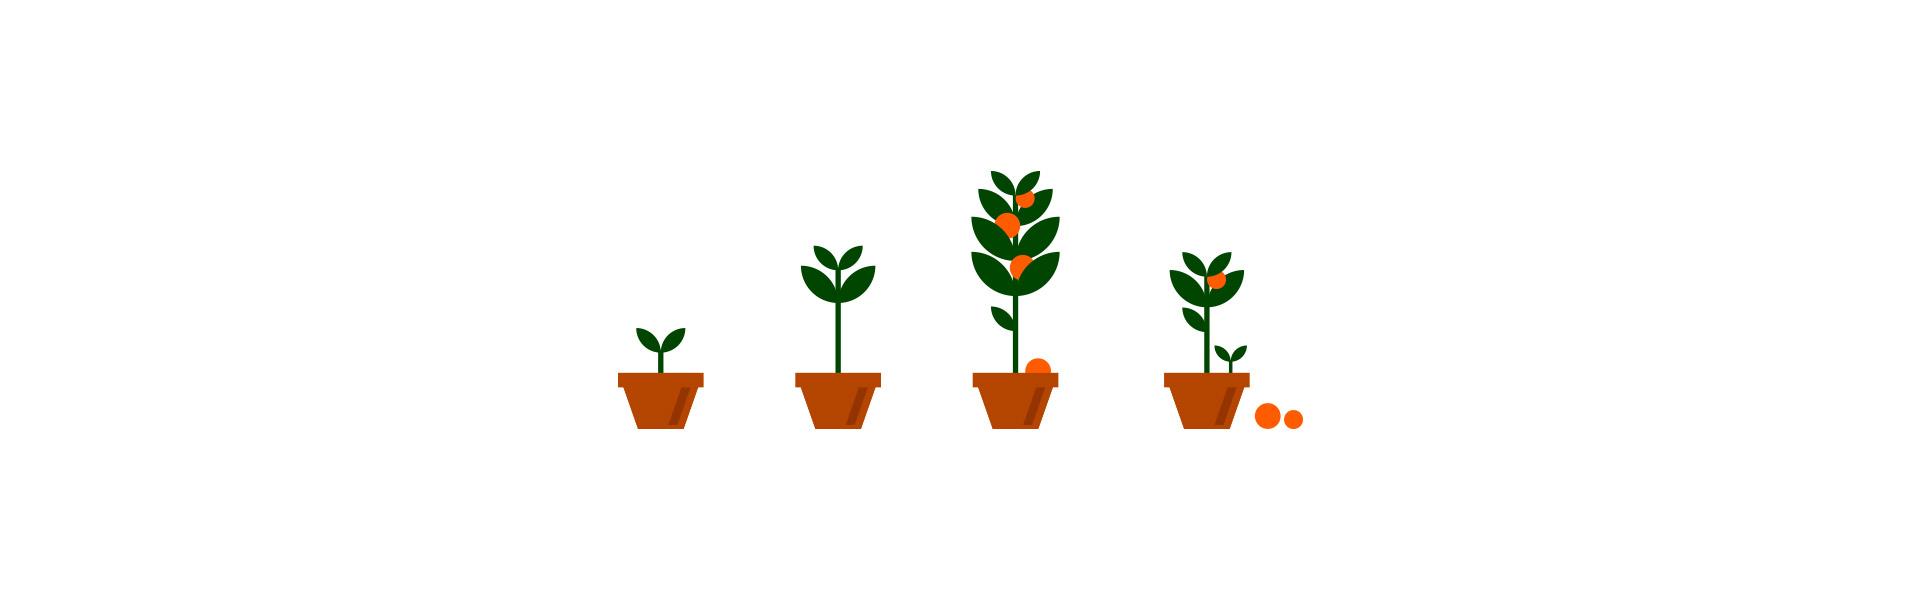 Illustrations of plants